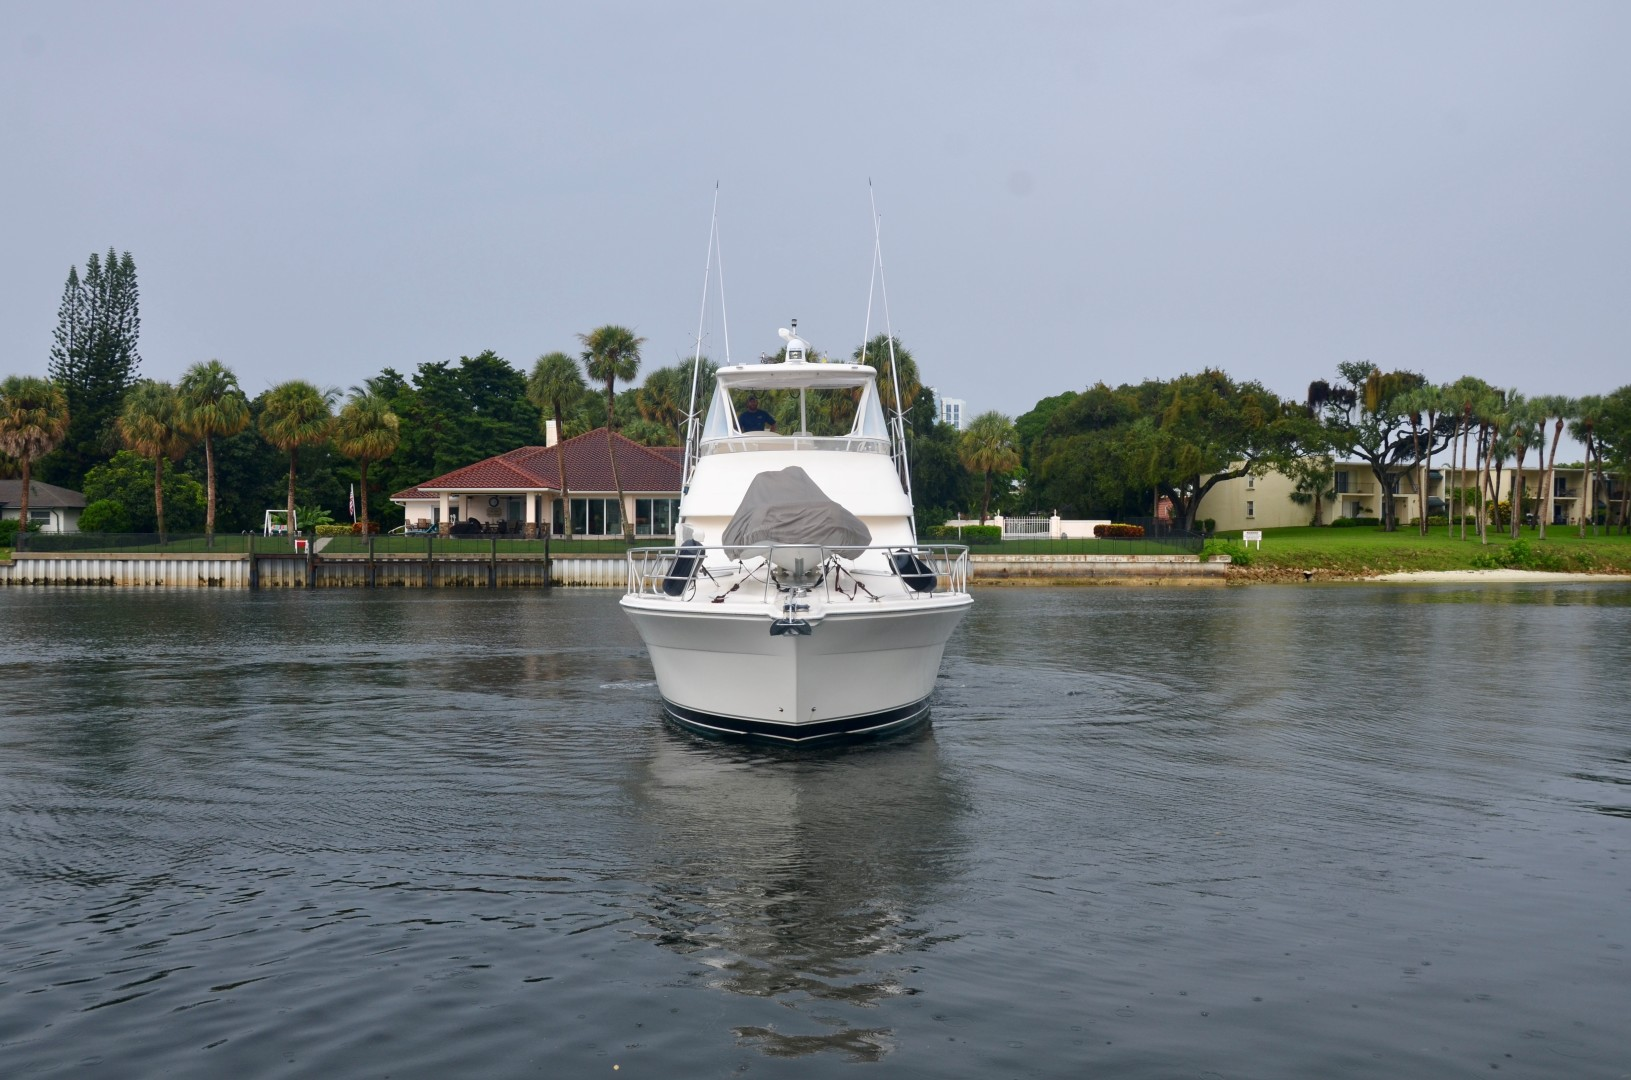 Riviera 42 - No Worries Mate II - Exterior Profile